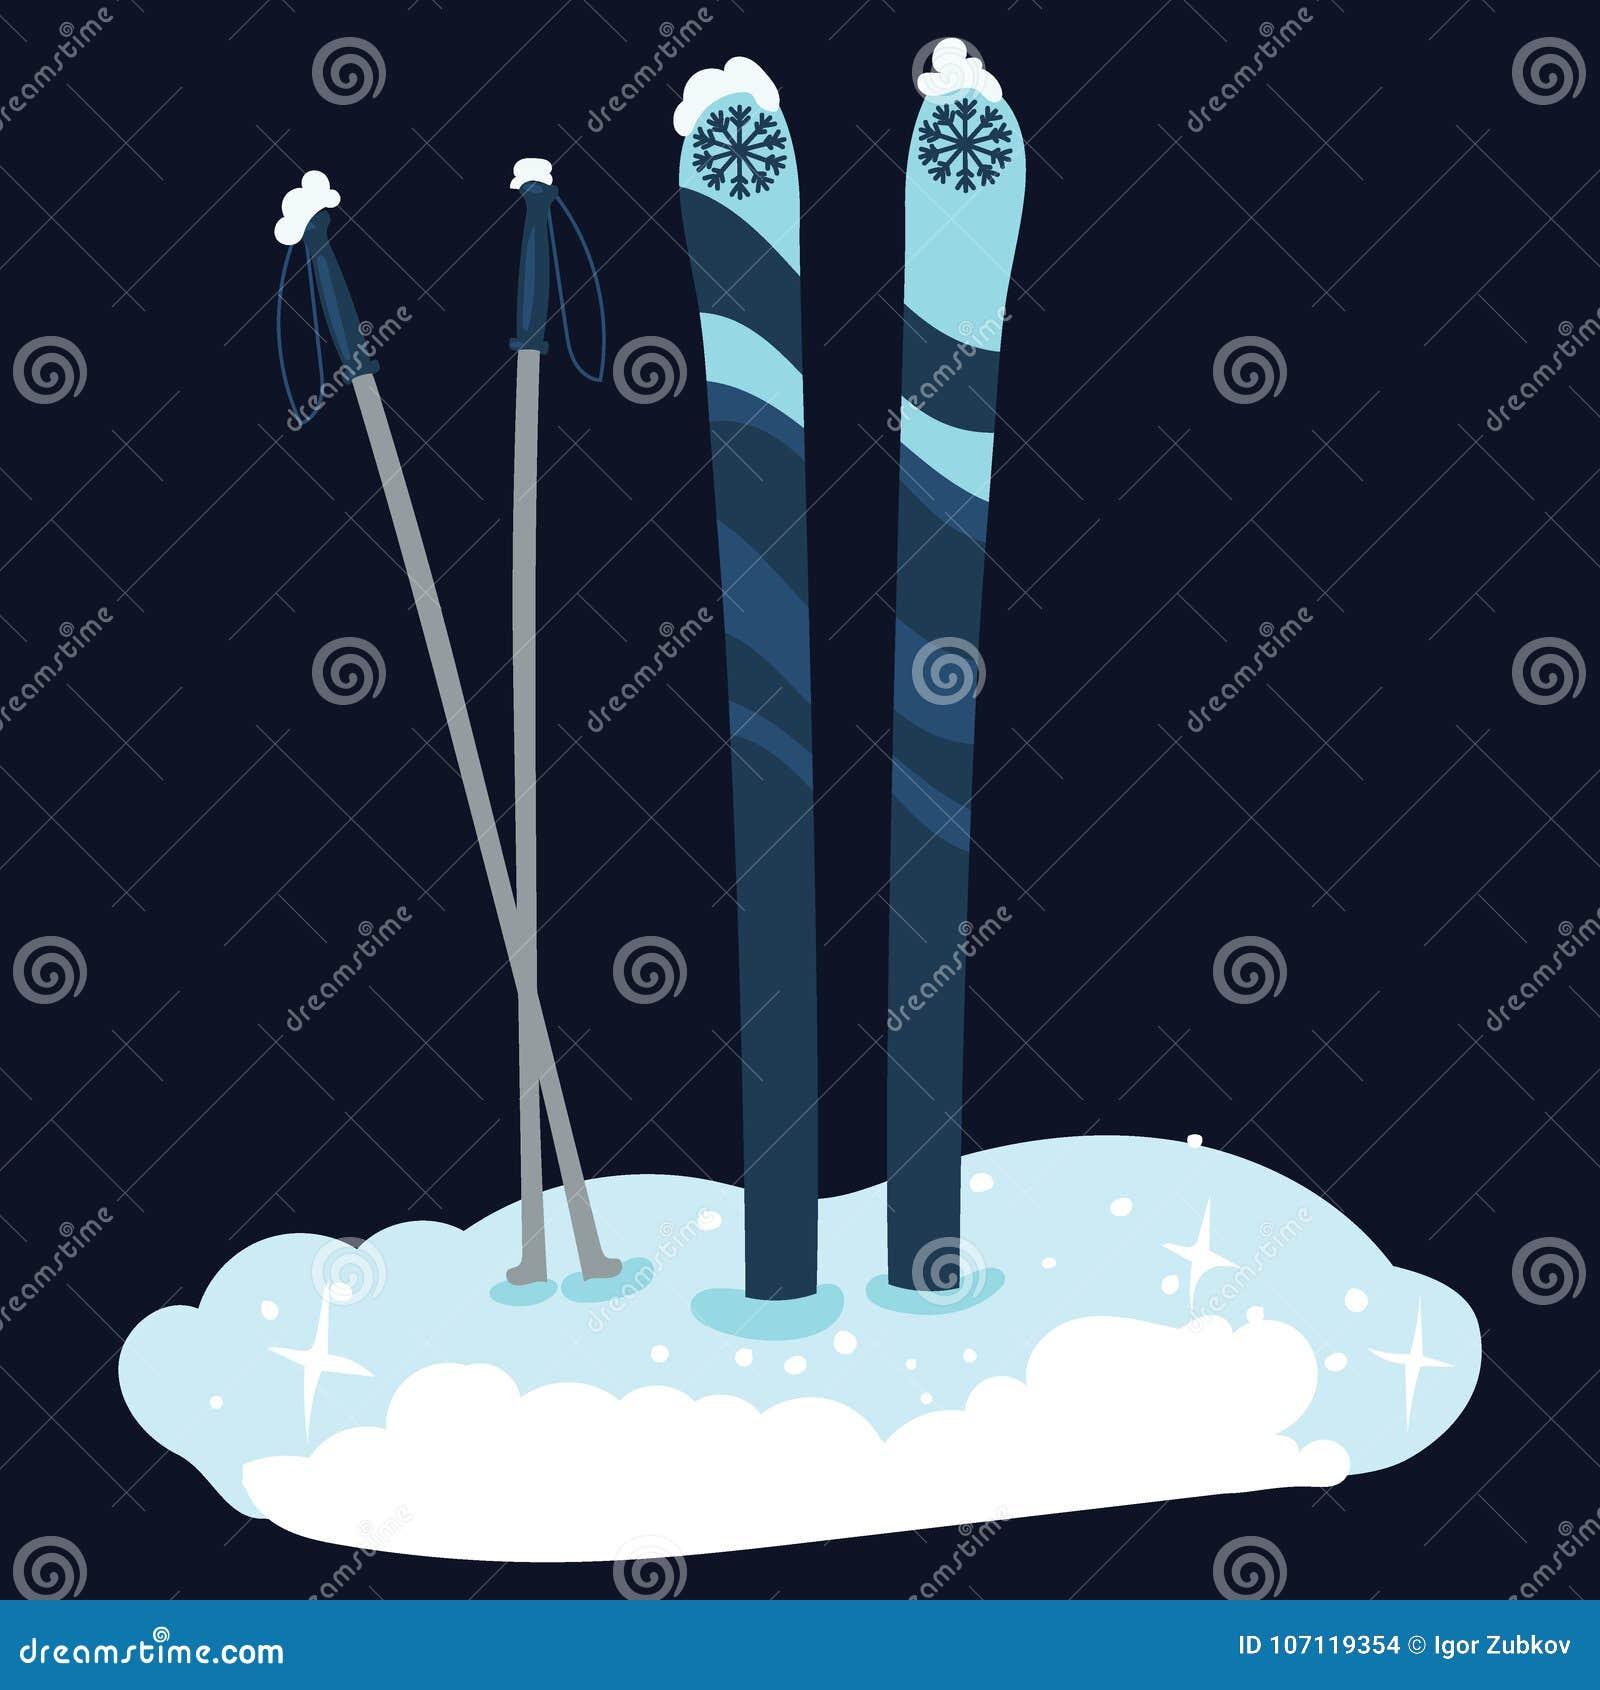 Cartoon skis in the snow. Winter sport. Vector illustration